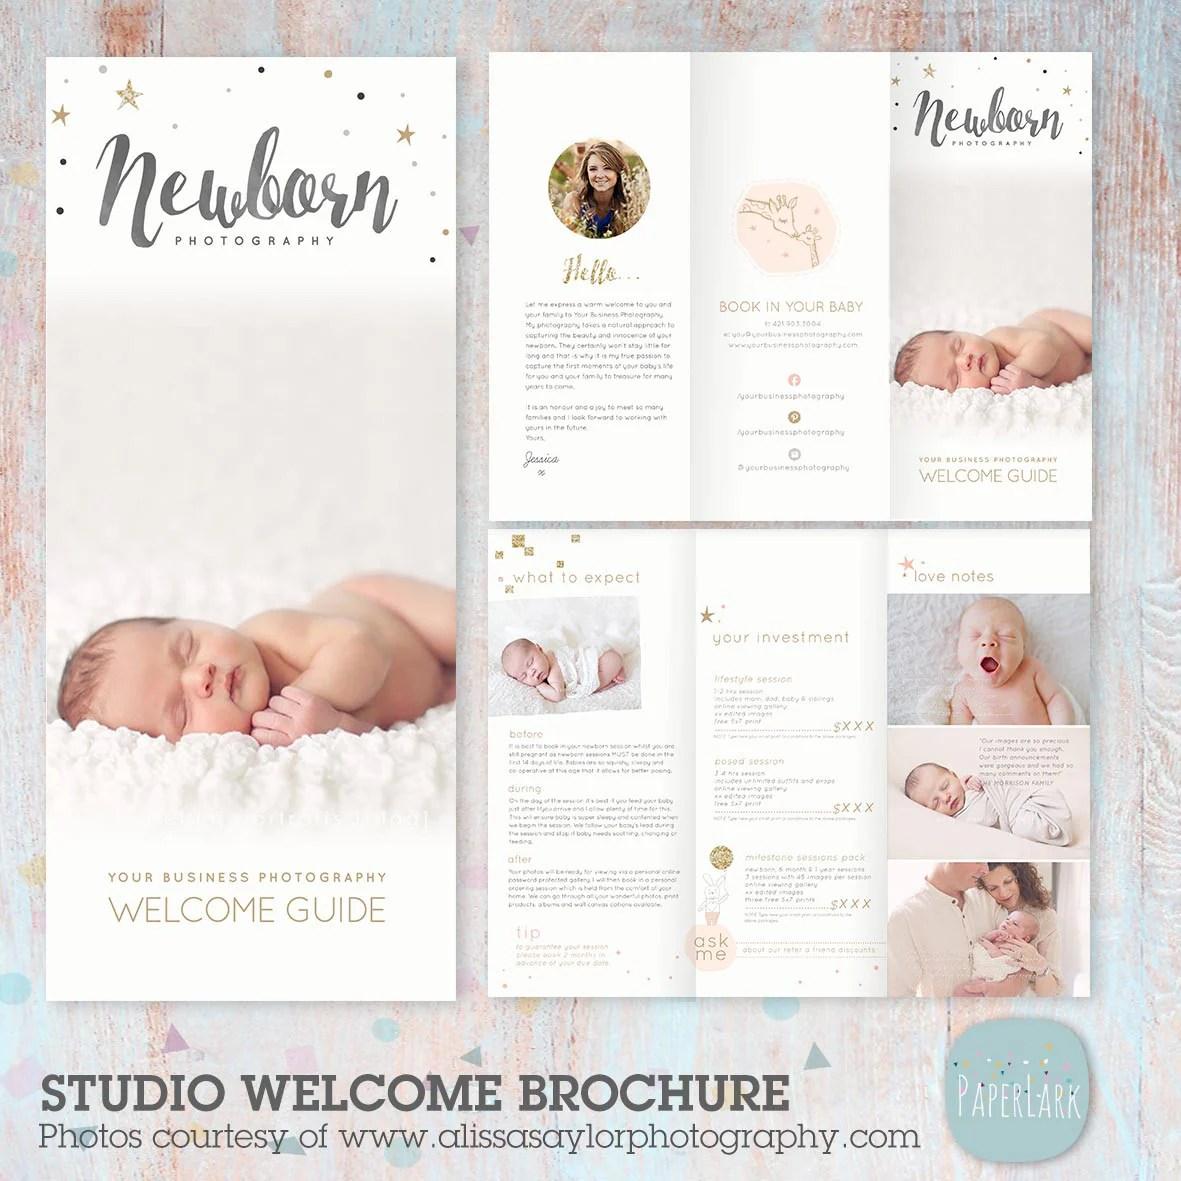 Newborn Photography Trifold Brochure Template PG019